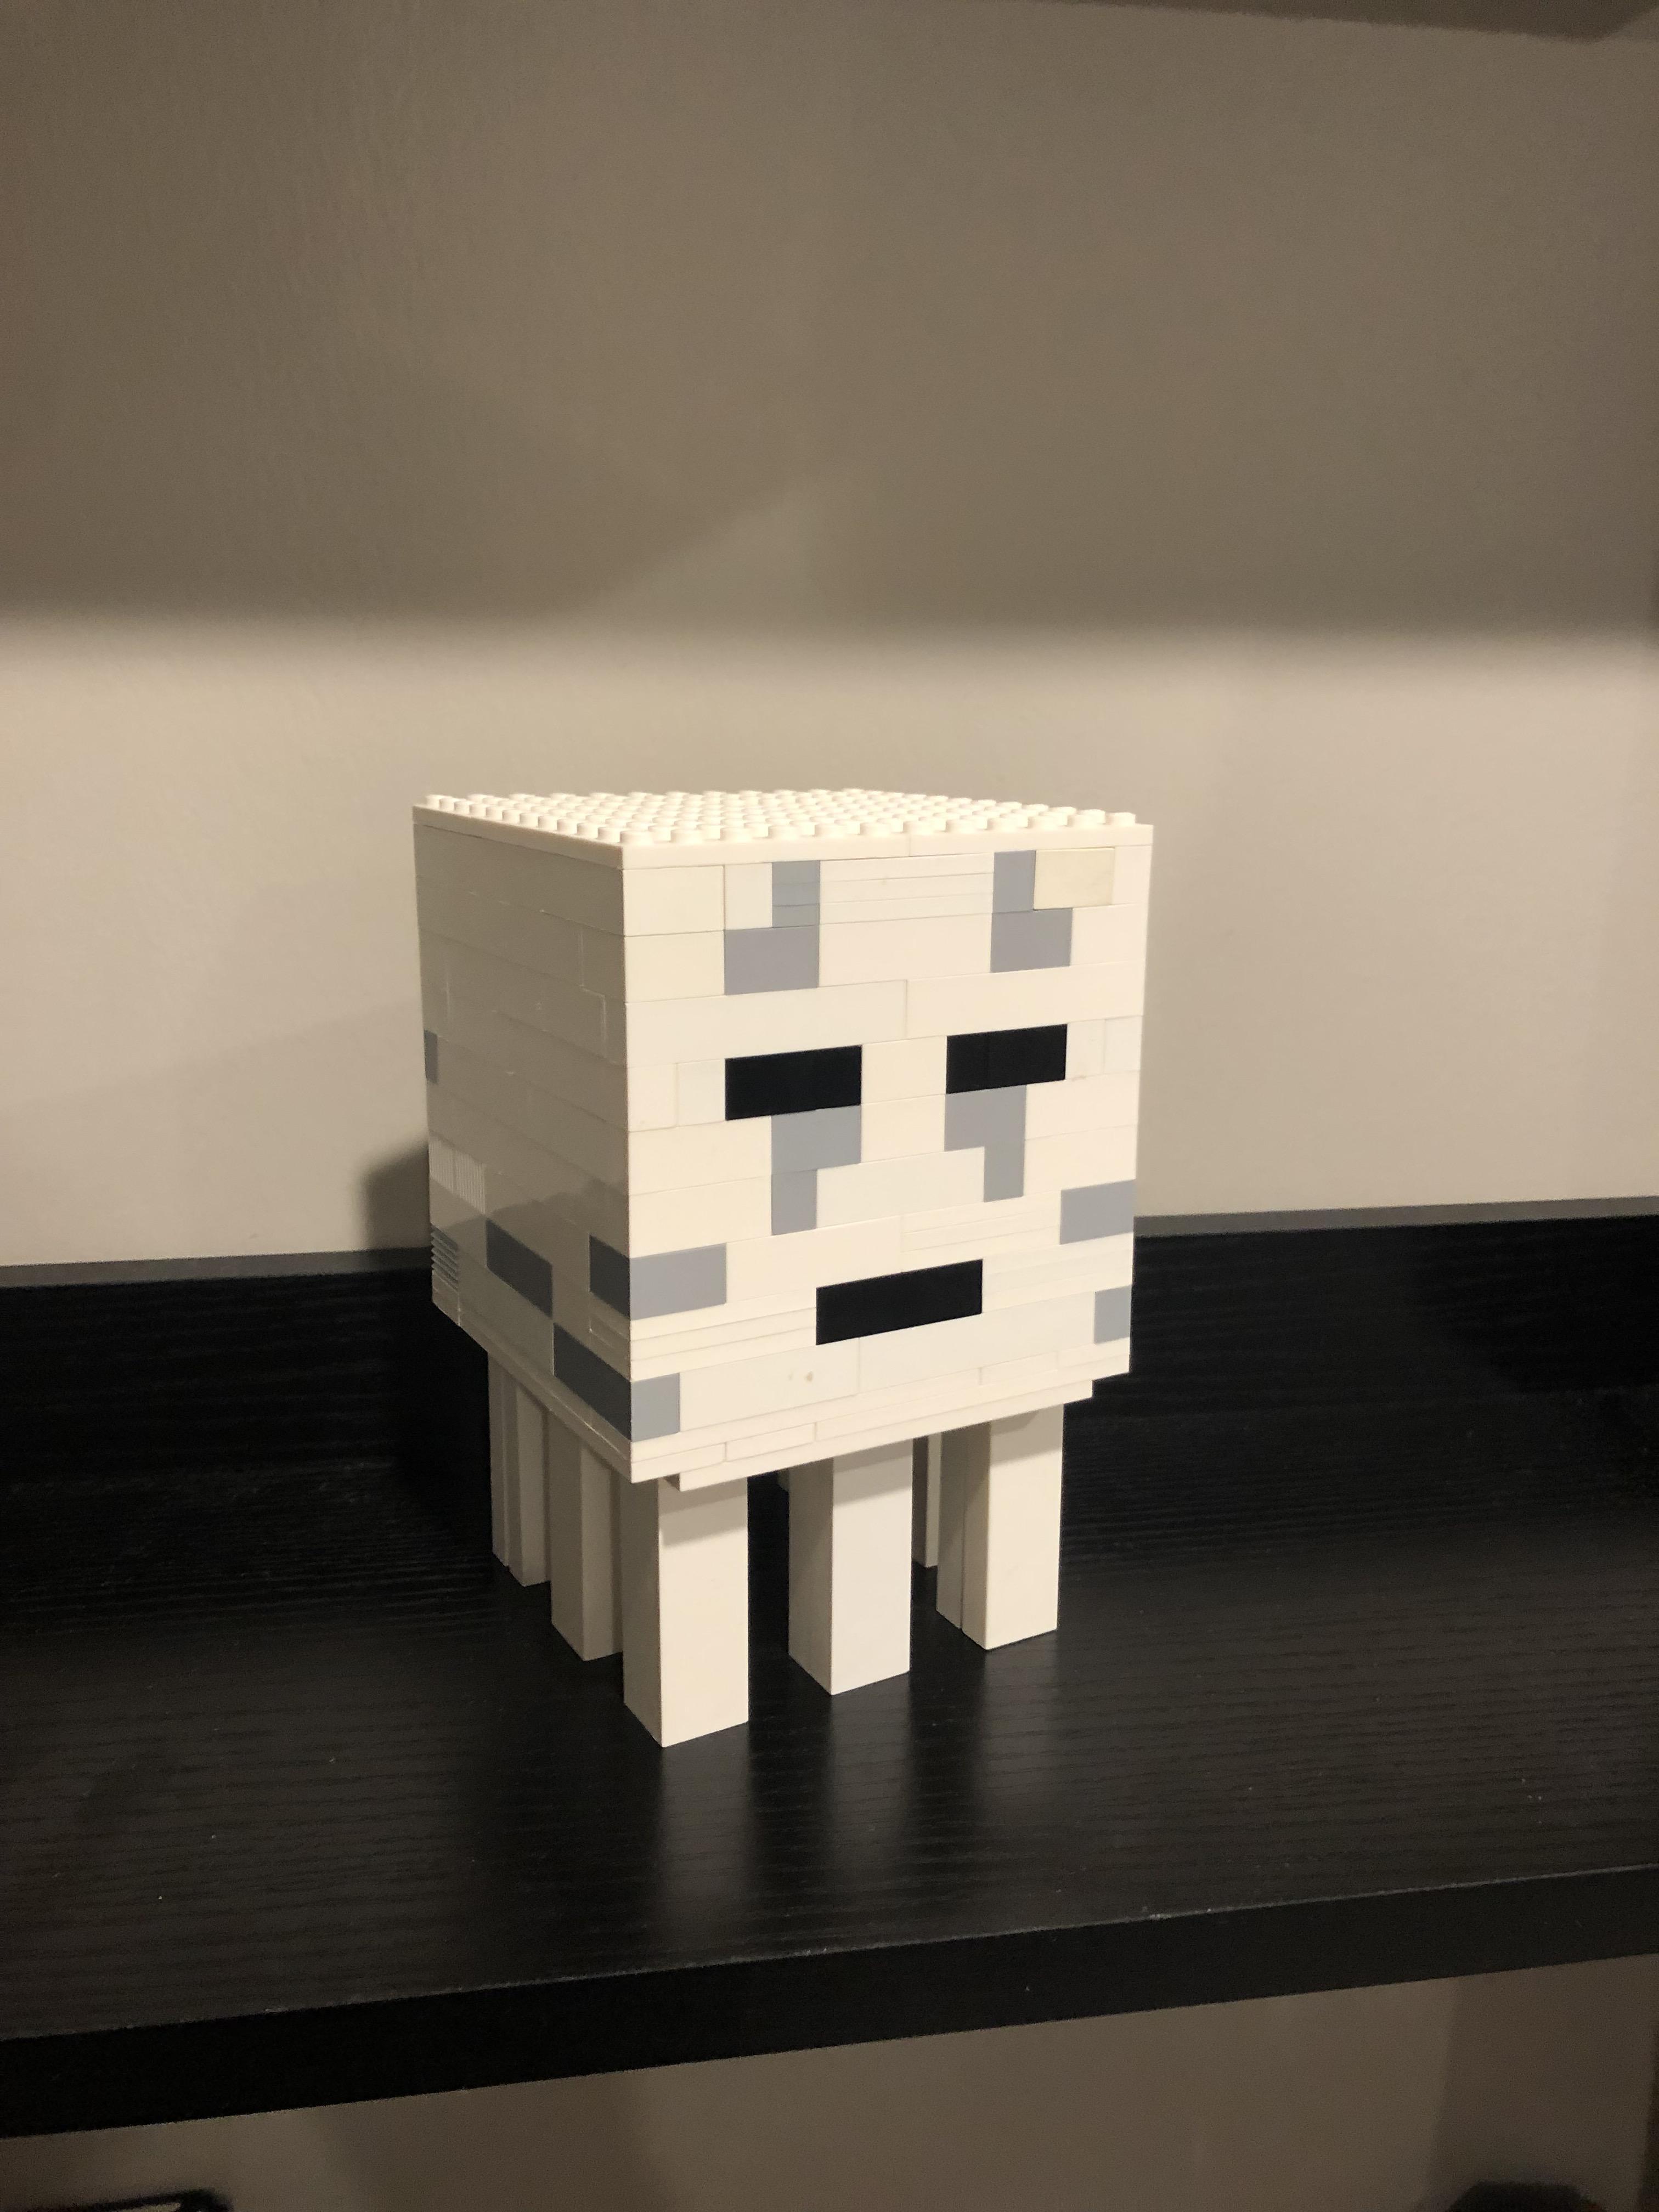 lego minecraft ghast instructions